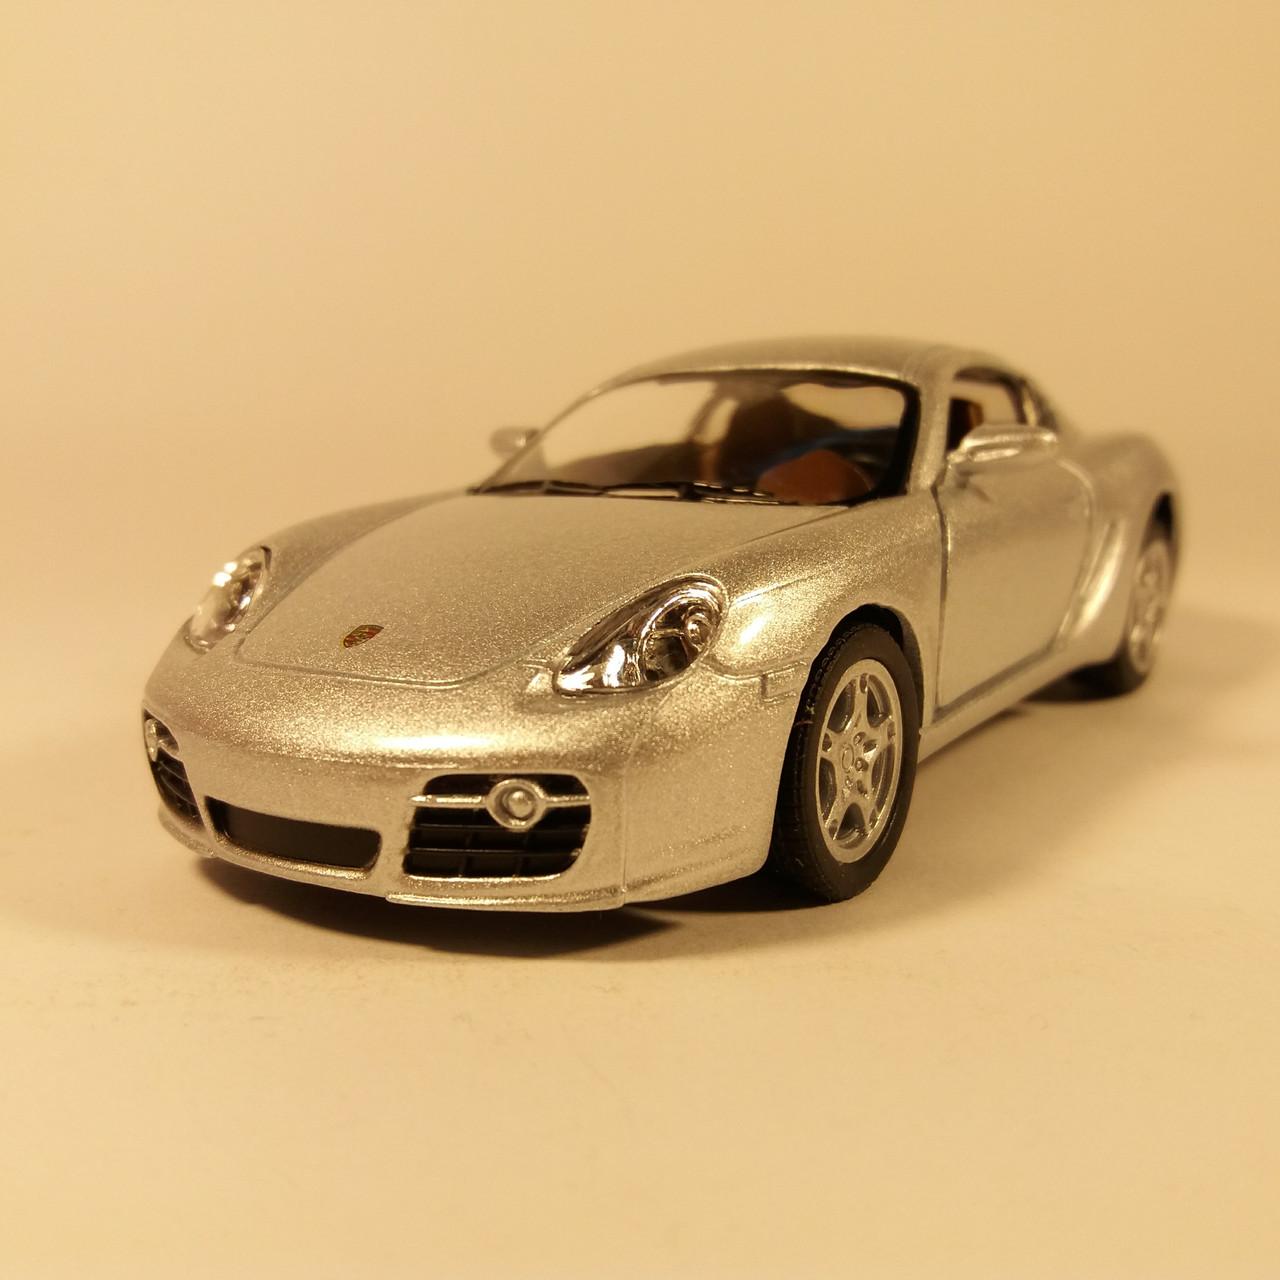 Автомобиль металлический KINSMART Porsche Cayman S KT5307W silver